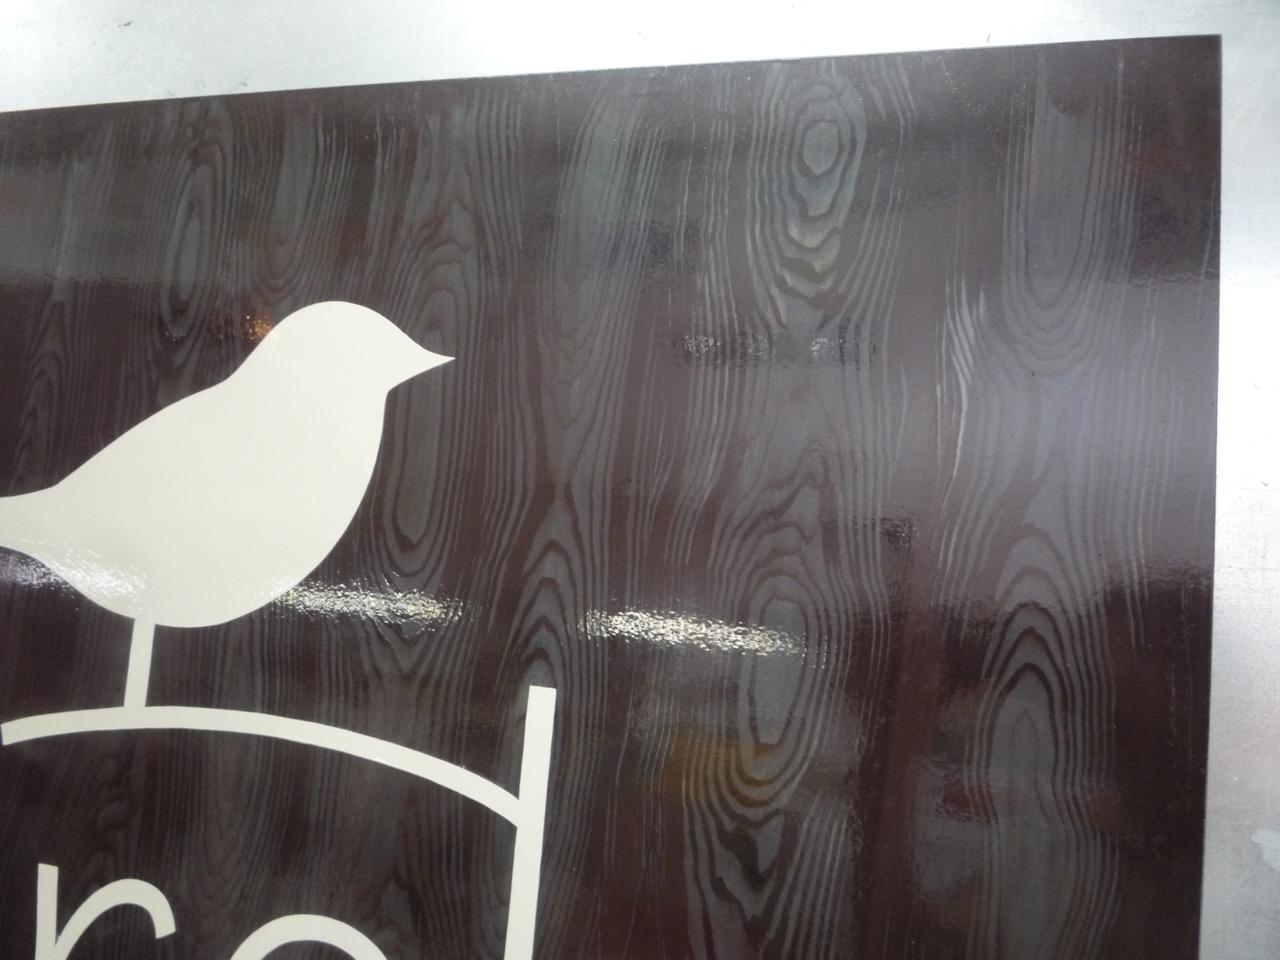 WOOD-faux-wood-grain-perch-close-up-2_23891059286_o.jpg